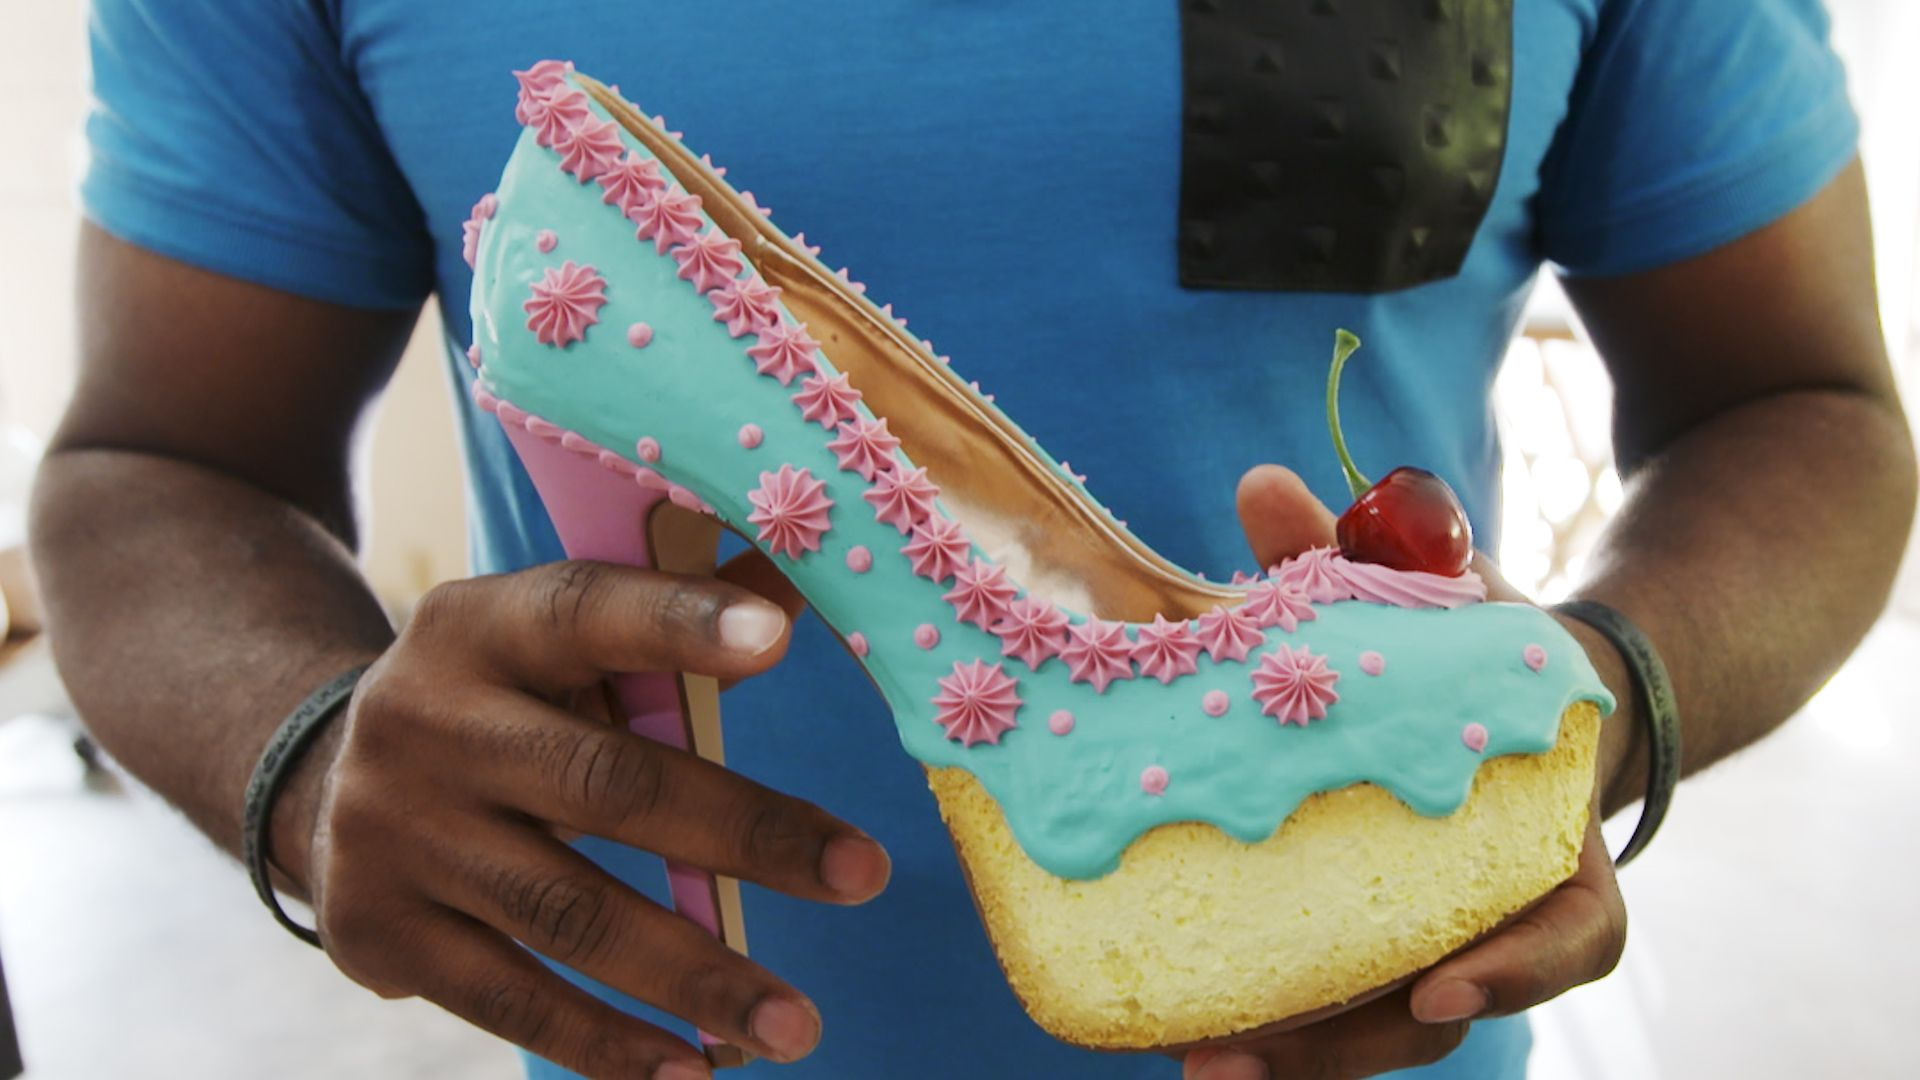 760e7a5720 Shoe Baker - Dessert Shoe Designer